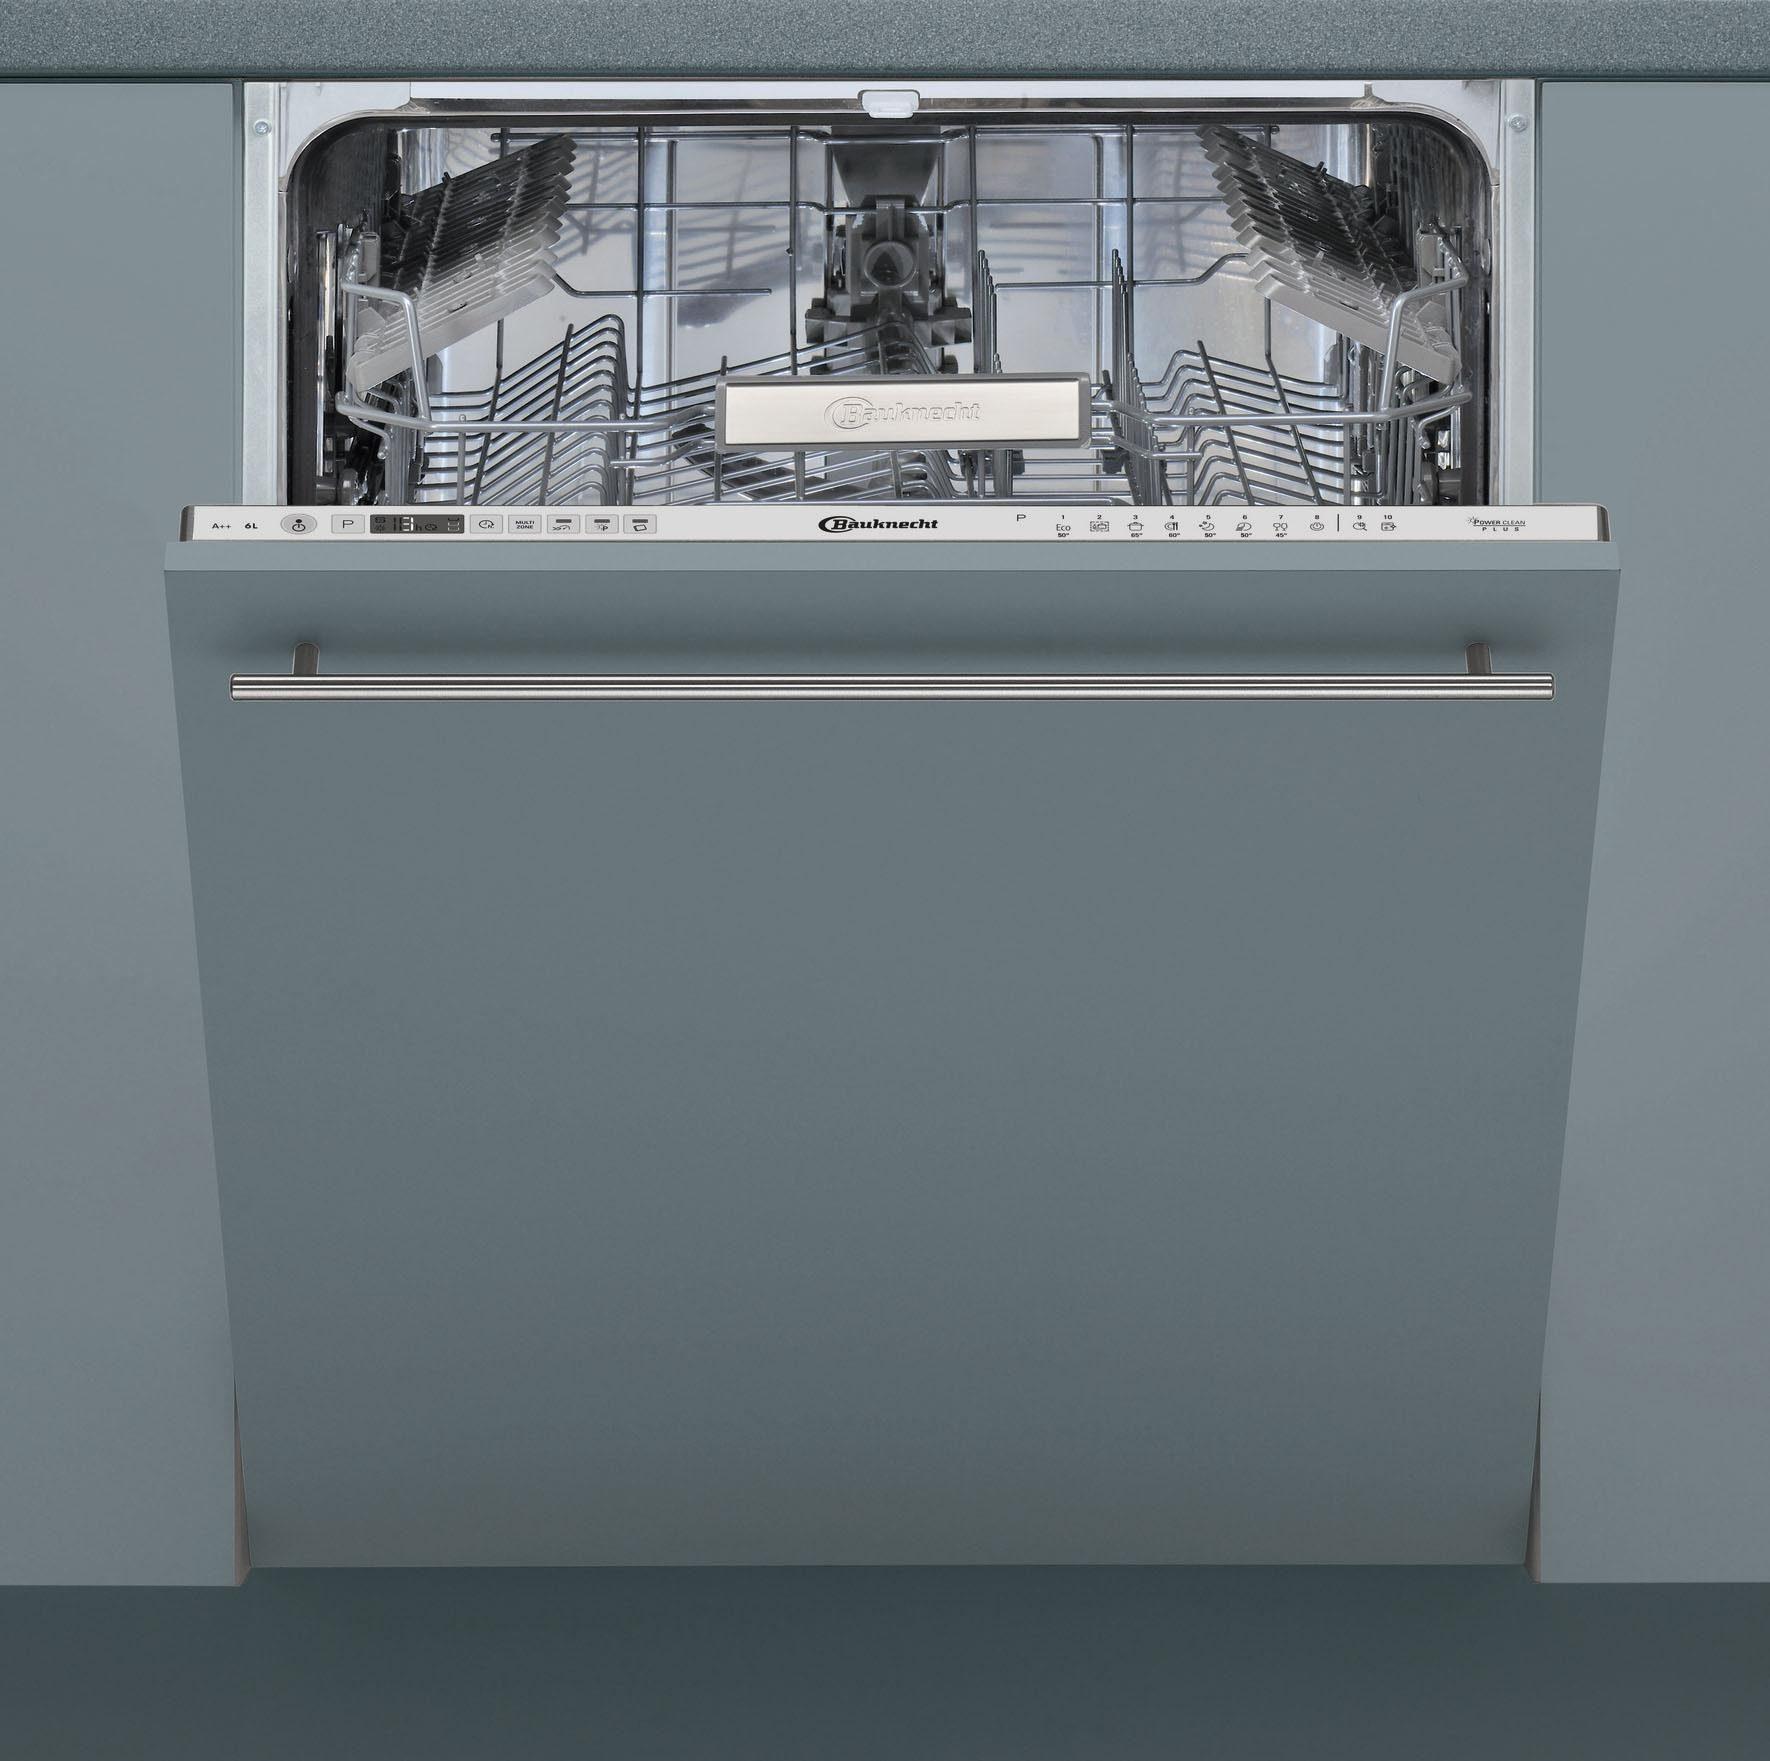 BAUKNECHT vollintegrierbarer Geschirrspüler, BIO3T323PE6M, 6 l, 14 Maßgedecke, Energieeffizienzklasse A++